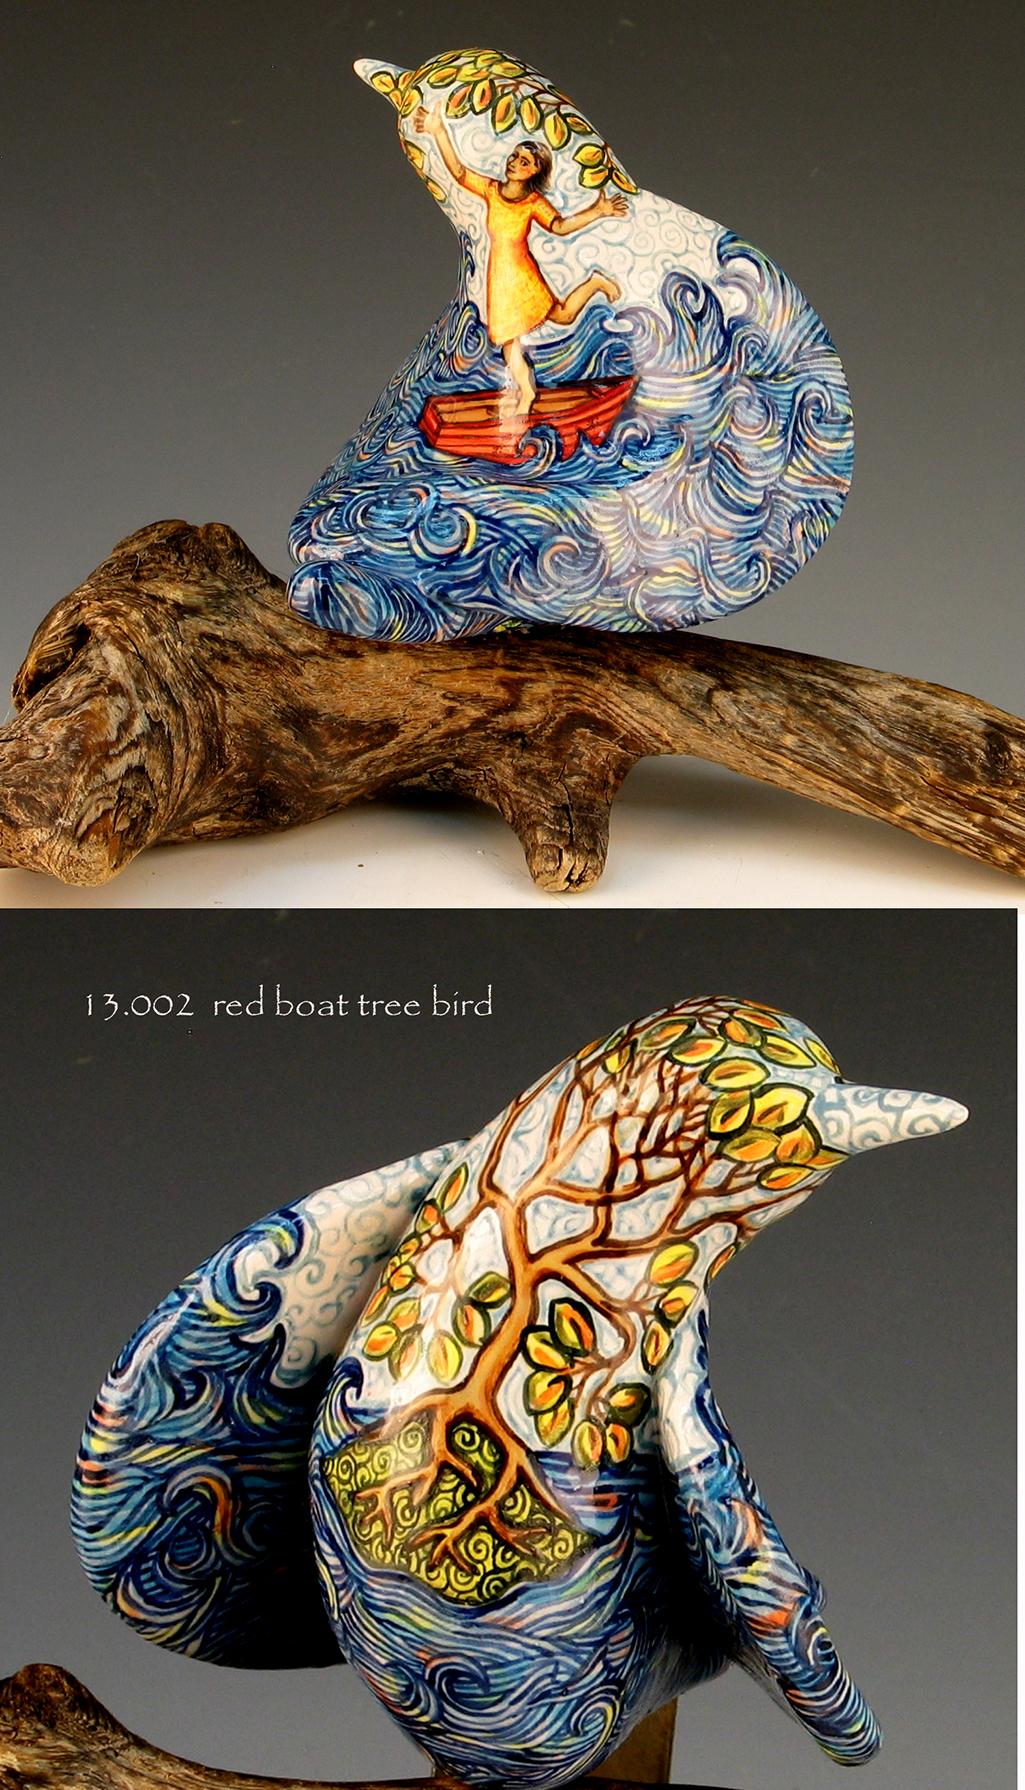 cathy weber - art - painting - woman - montana - ceramic - porcelain - bird - narrative - clay - glazed